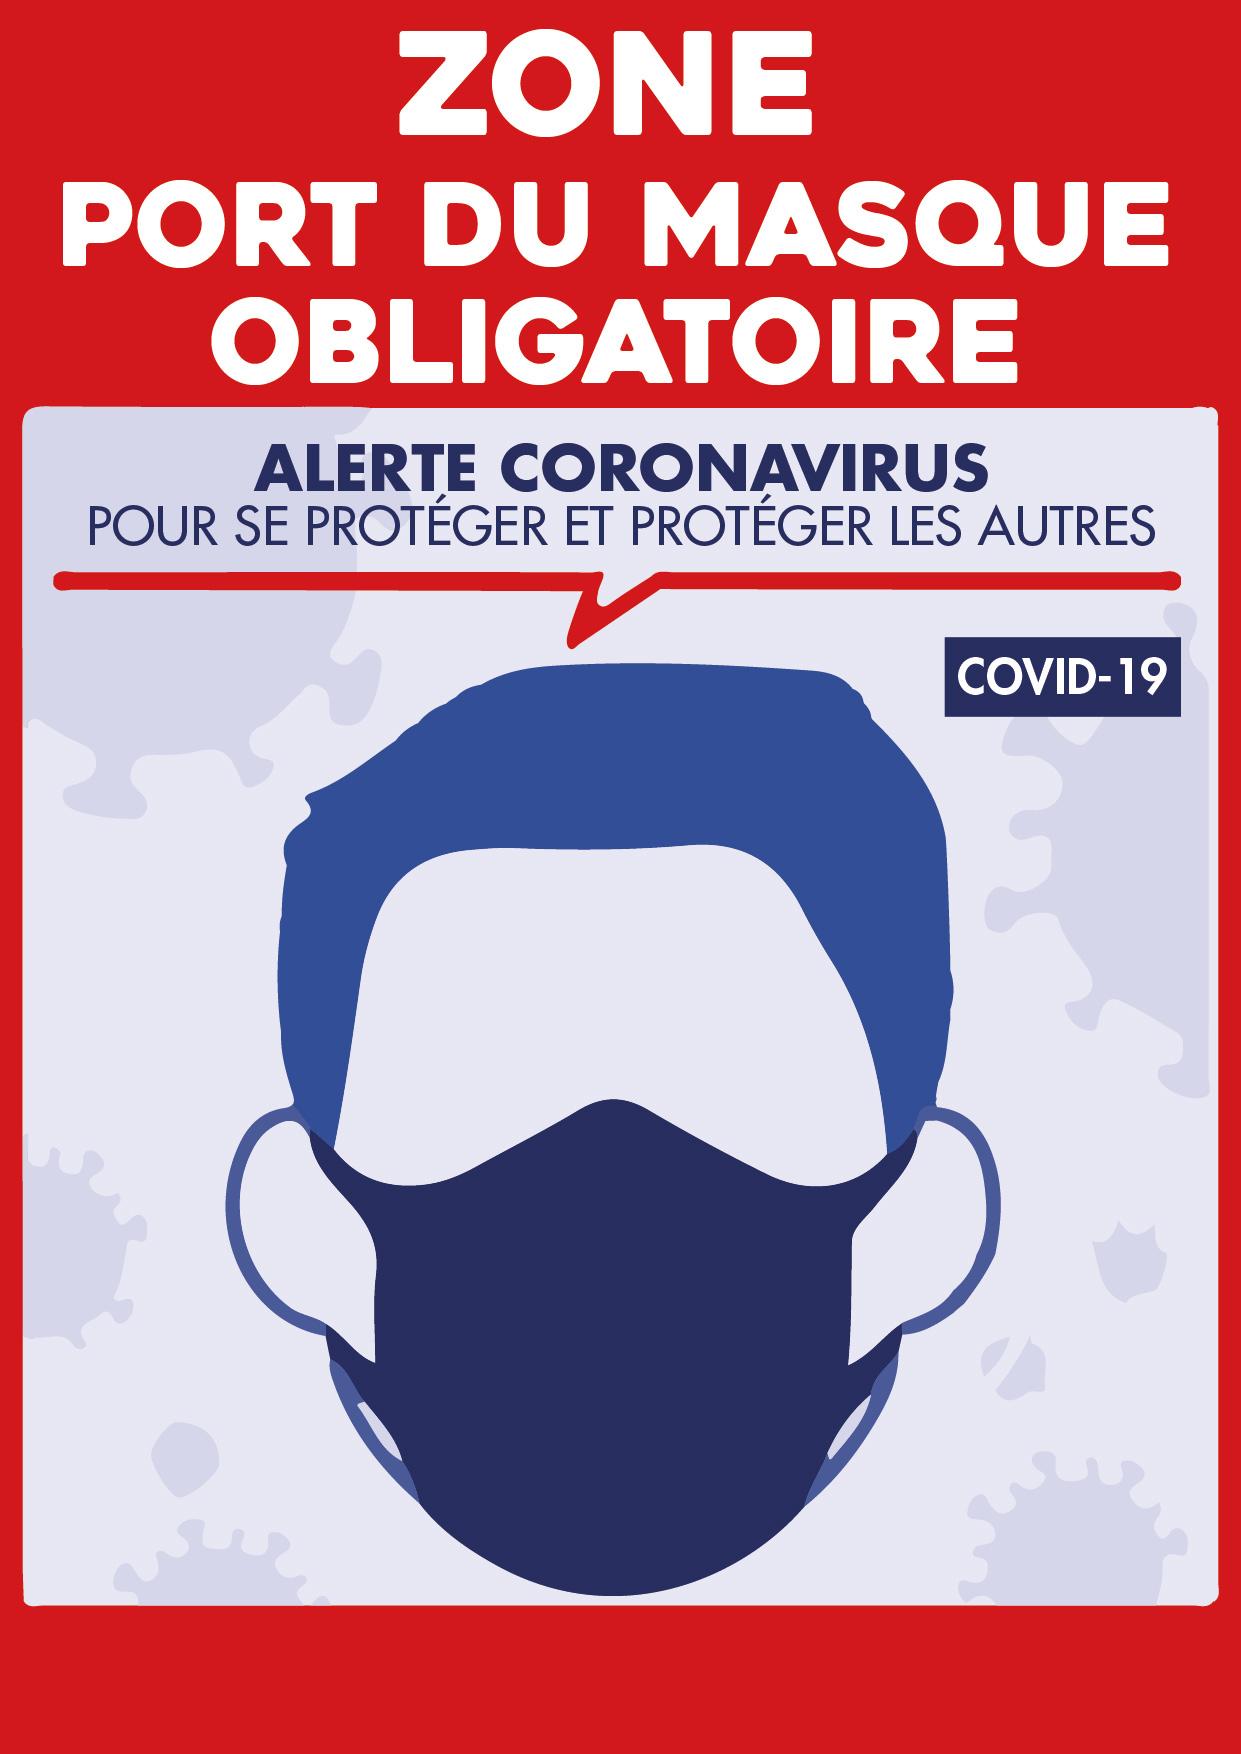 affiche_port_masque_obligatoire-zone.jpg